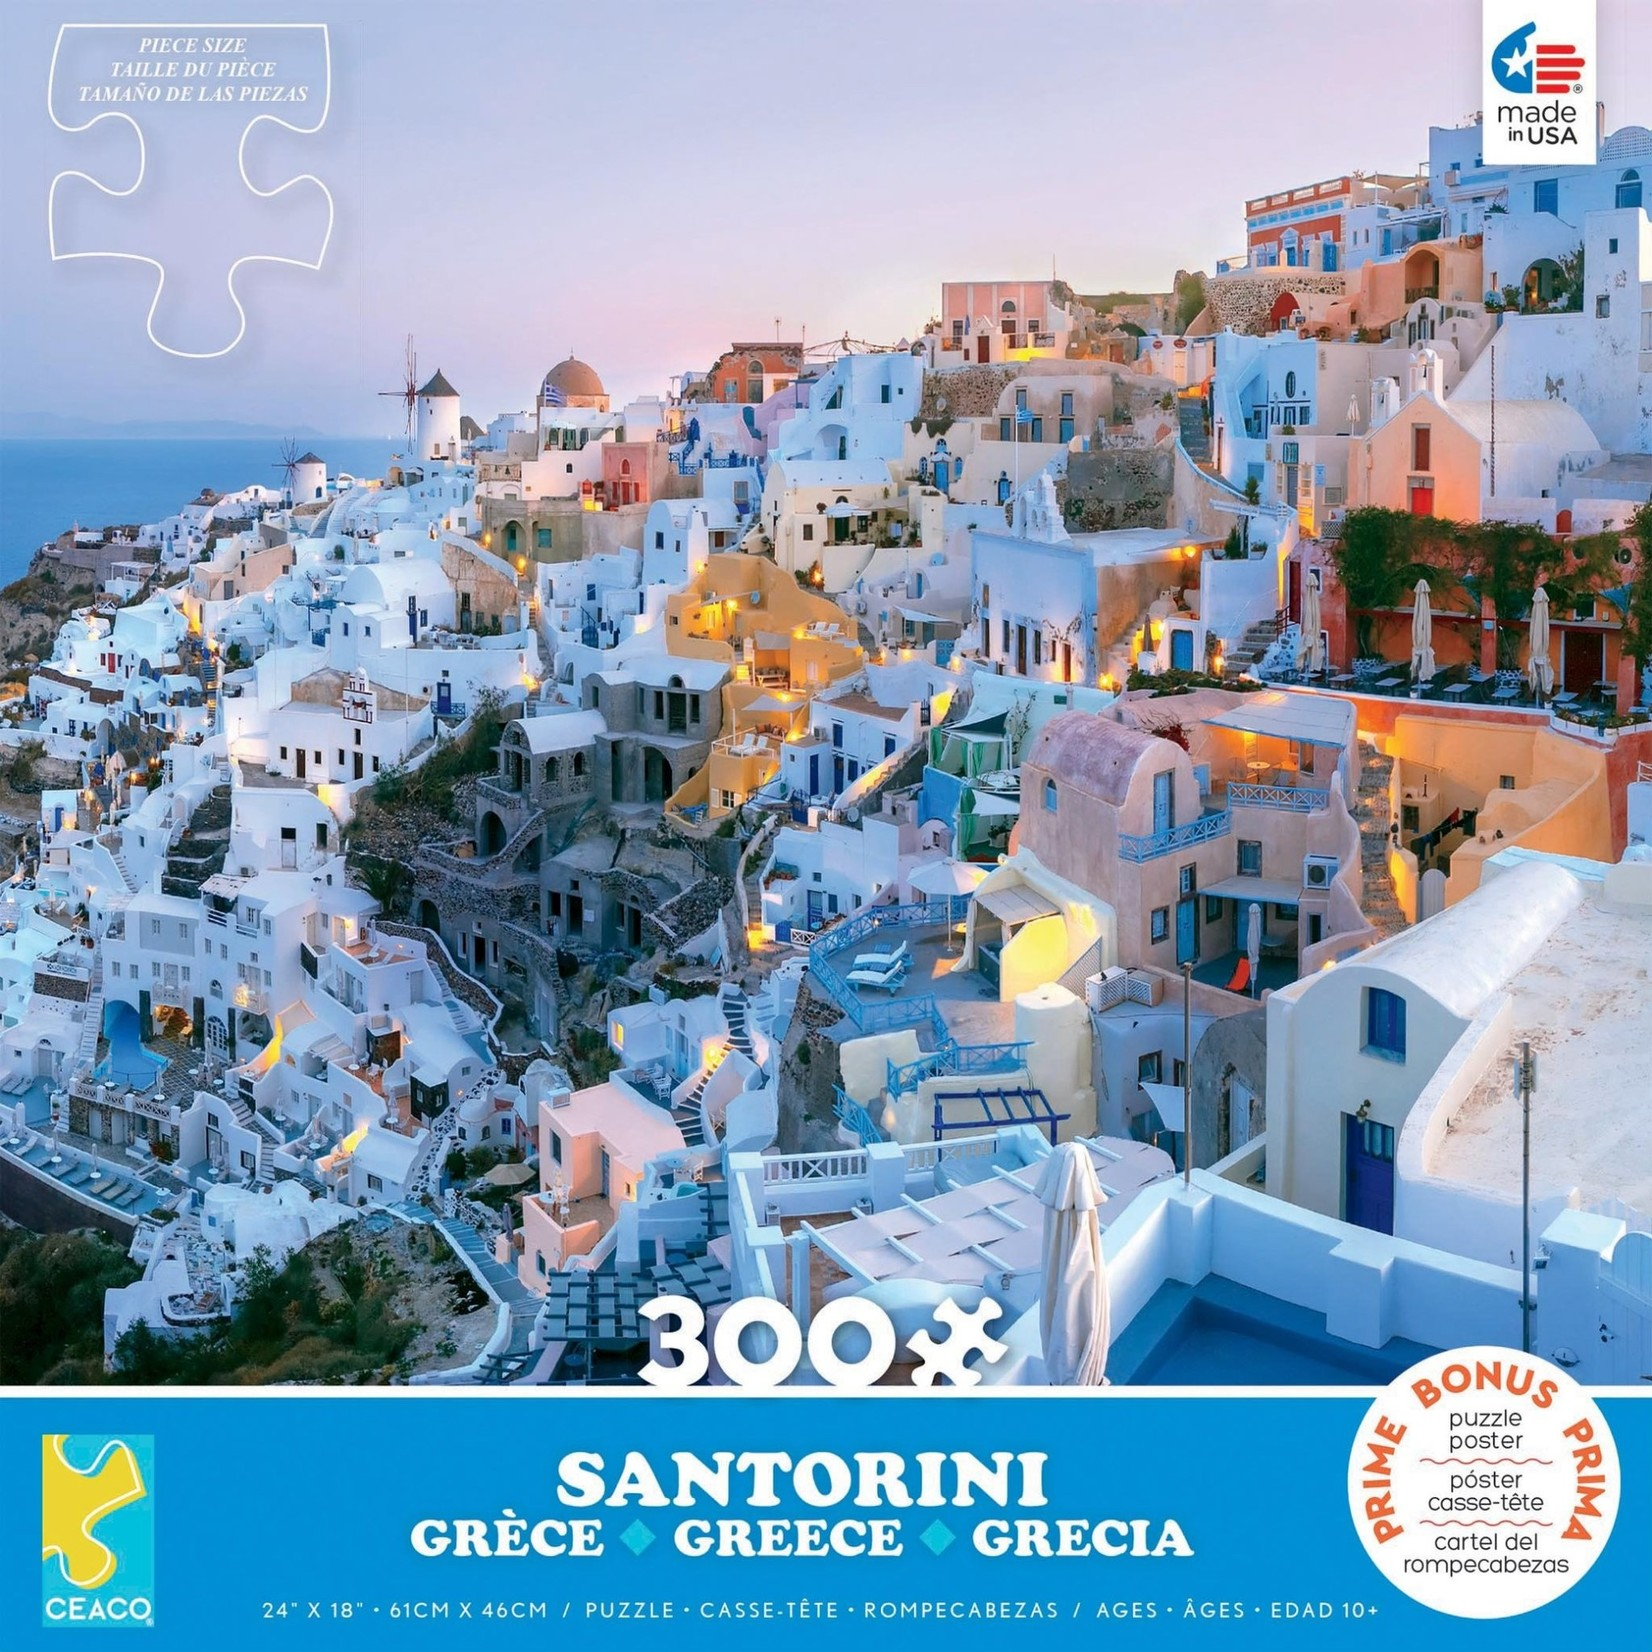 ceaco Ceaco - 300 Piece Puzzle (Oversized Pieces): Scenic Photography - Santorini